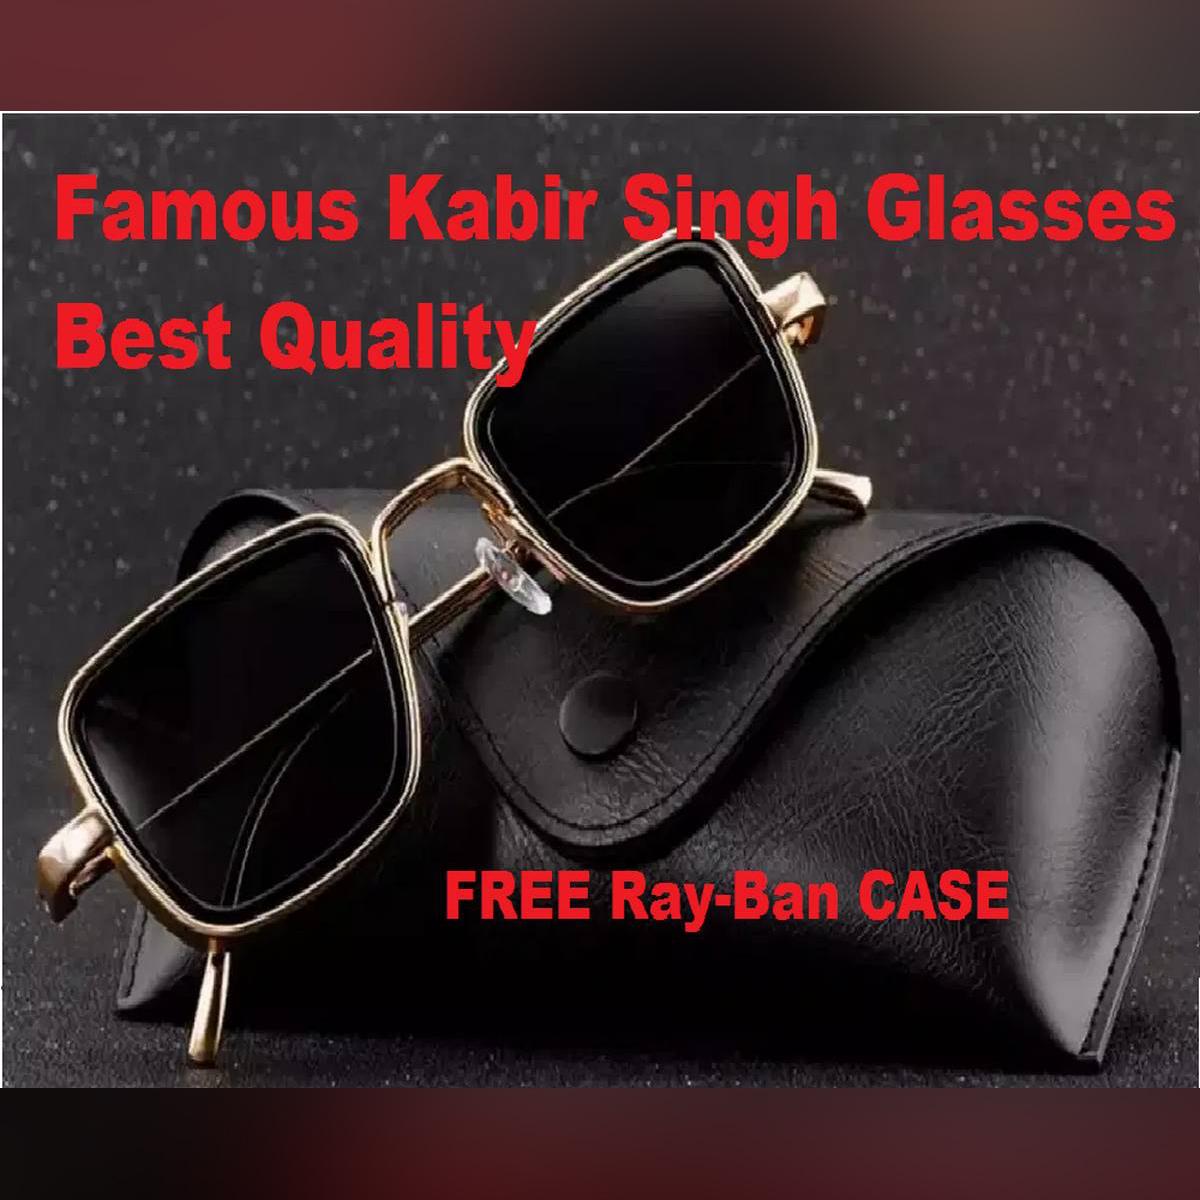 Kabir Singh India Movie Sunglasses Men Square Retro Cool Sun Shades Steampunk Style Sun Glasses for Men Silver Frame with Black Glass - Shahid Kapoor Sunglasses